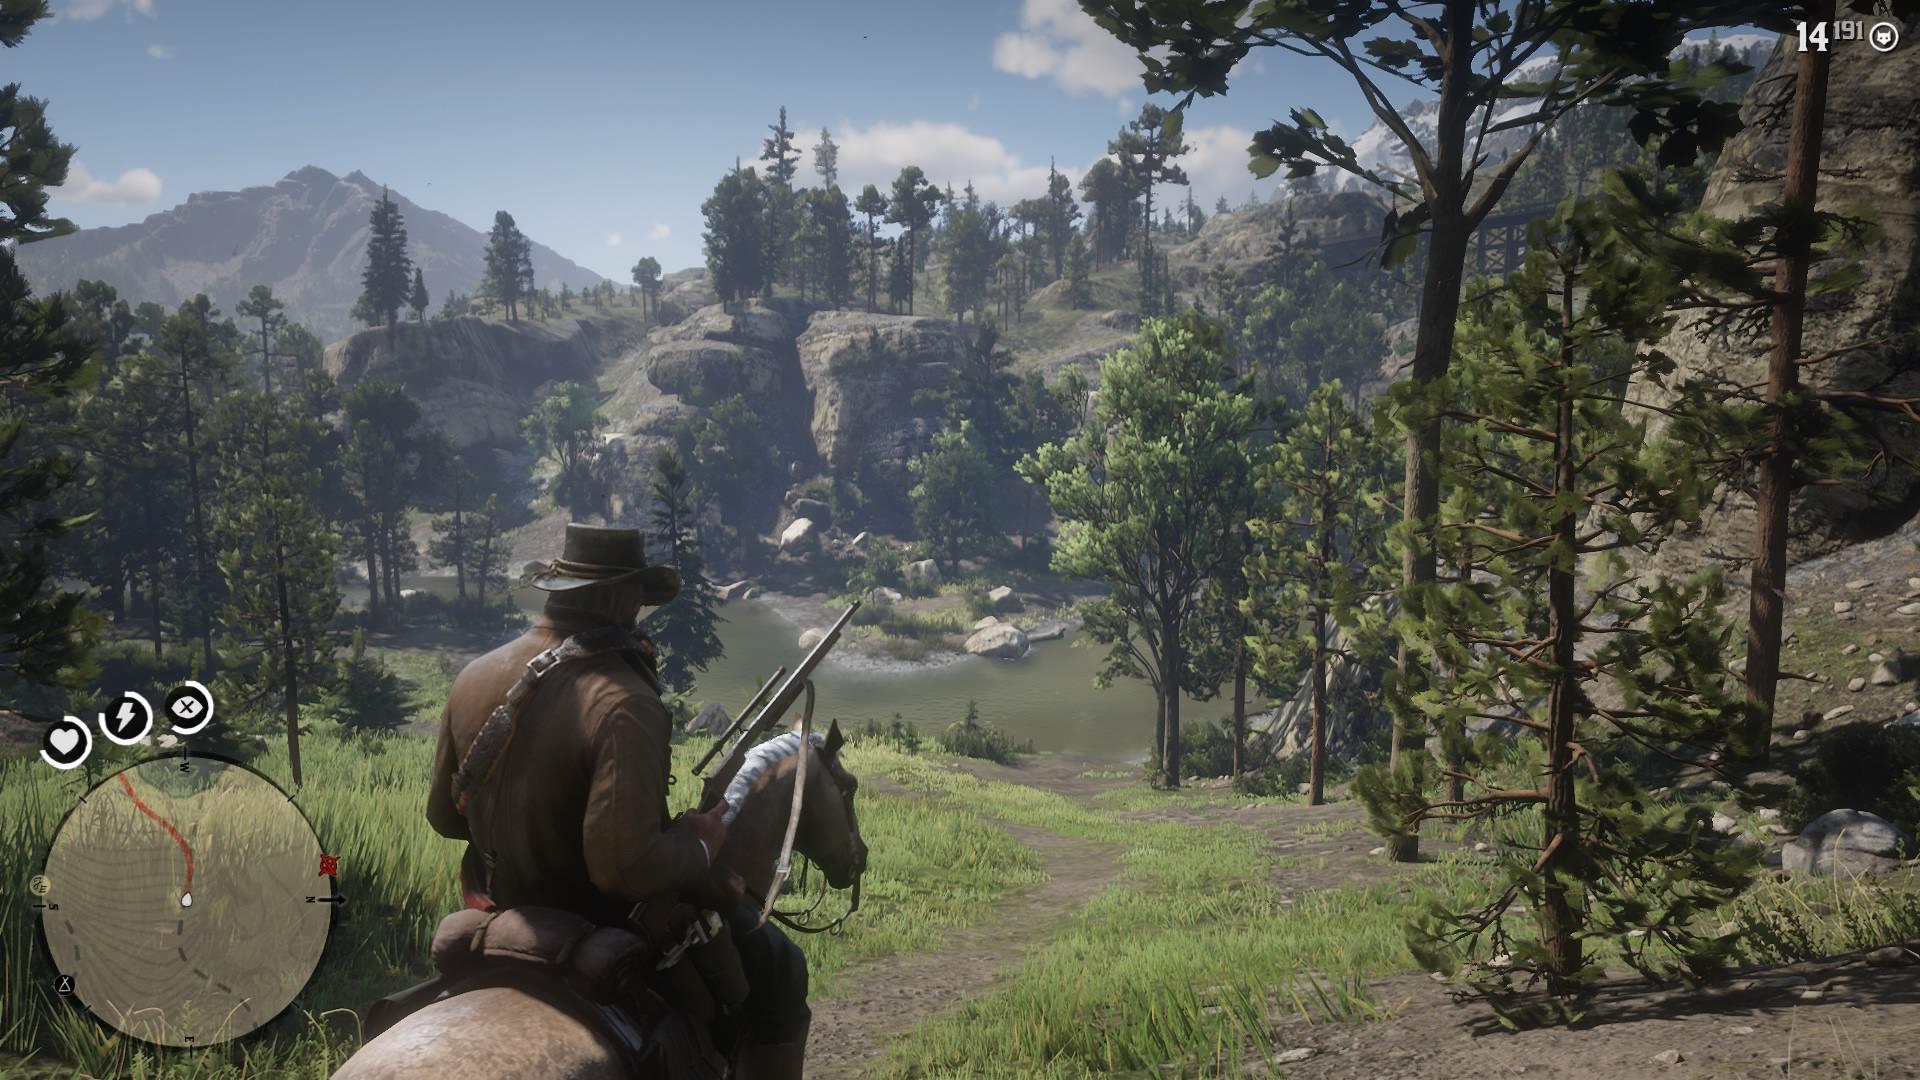 Red Dead Redemption 2_20190224111101.jpg - Red Dead Redemption 2